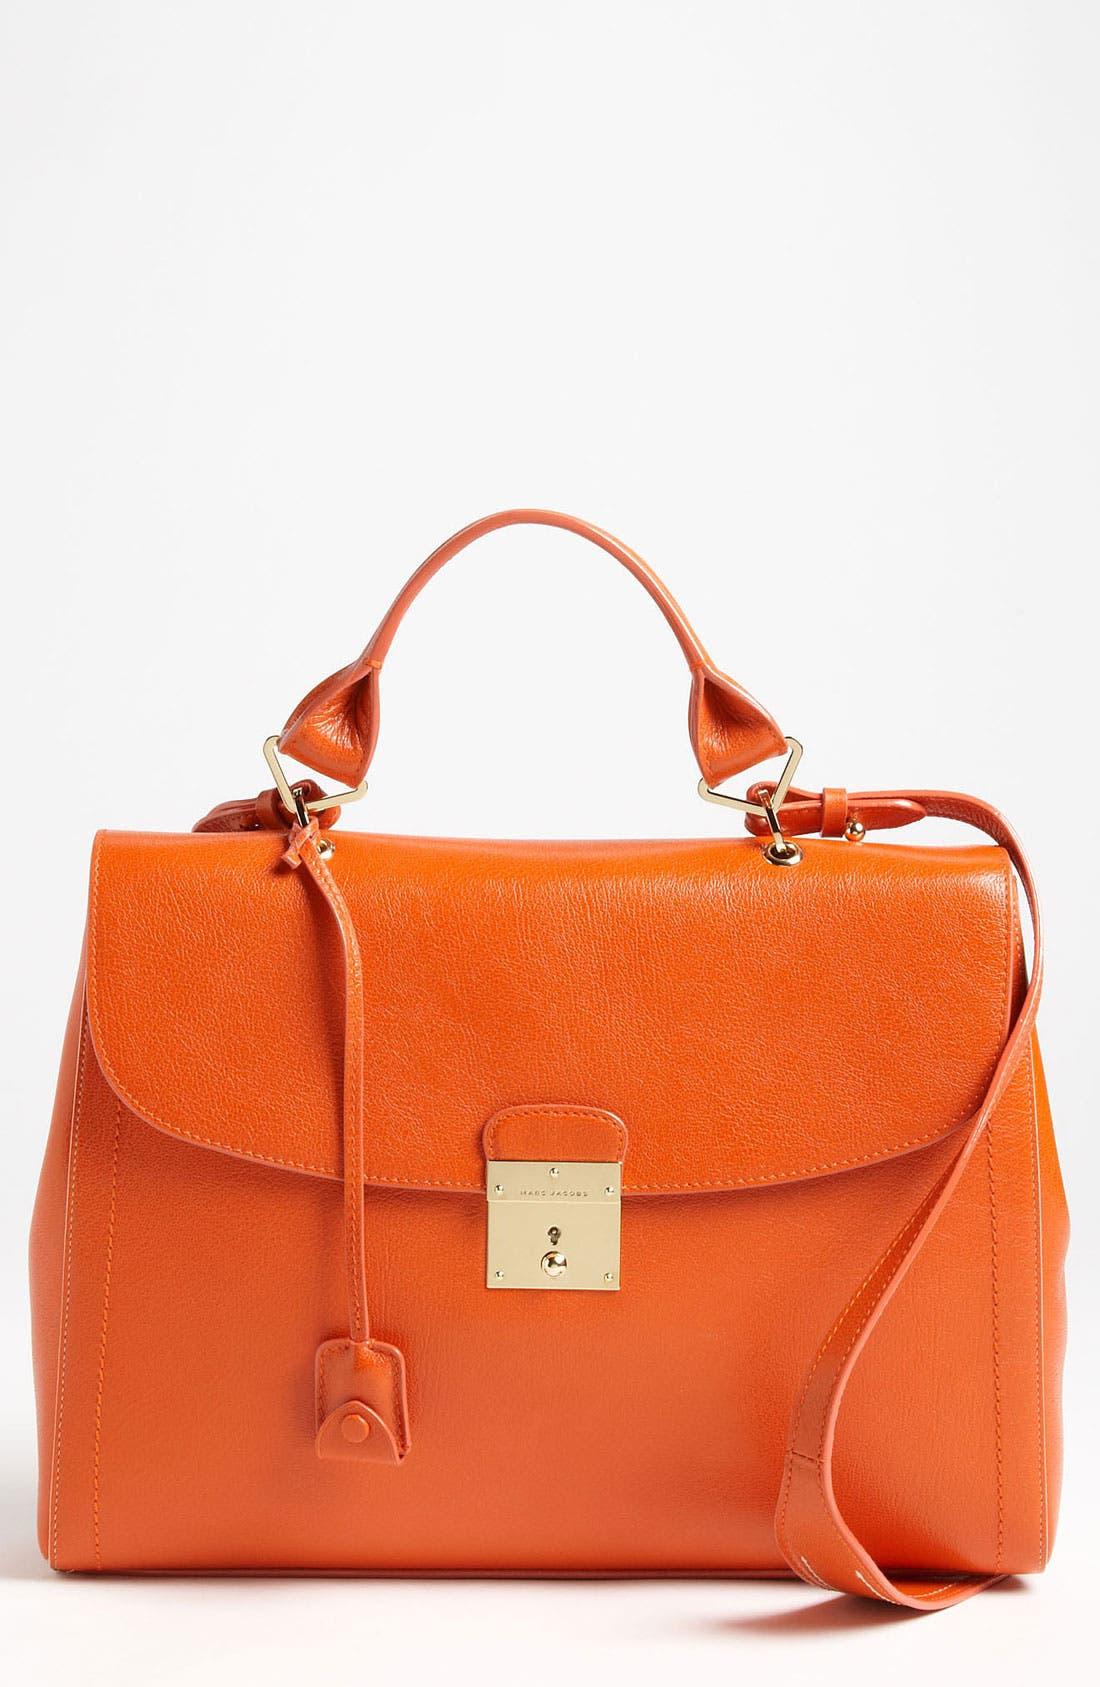 '1984' Leather Satchel,                             Main thumbnail 1, color,                             Mandarin